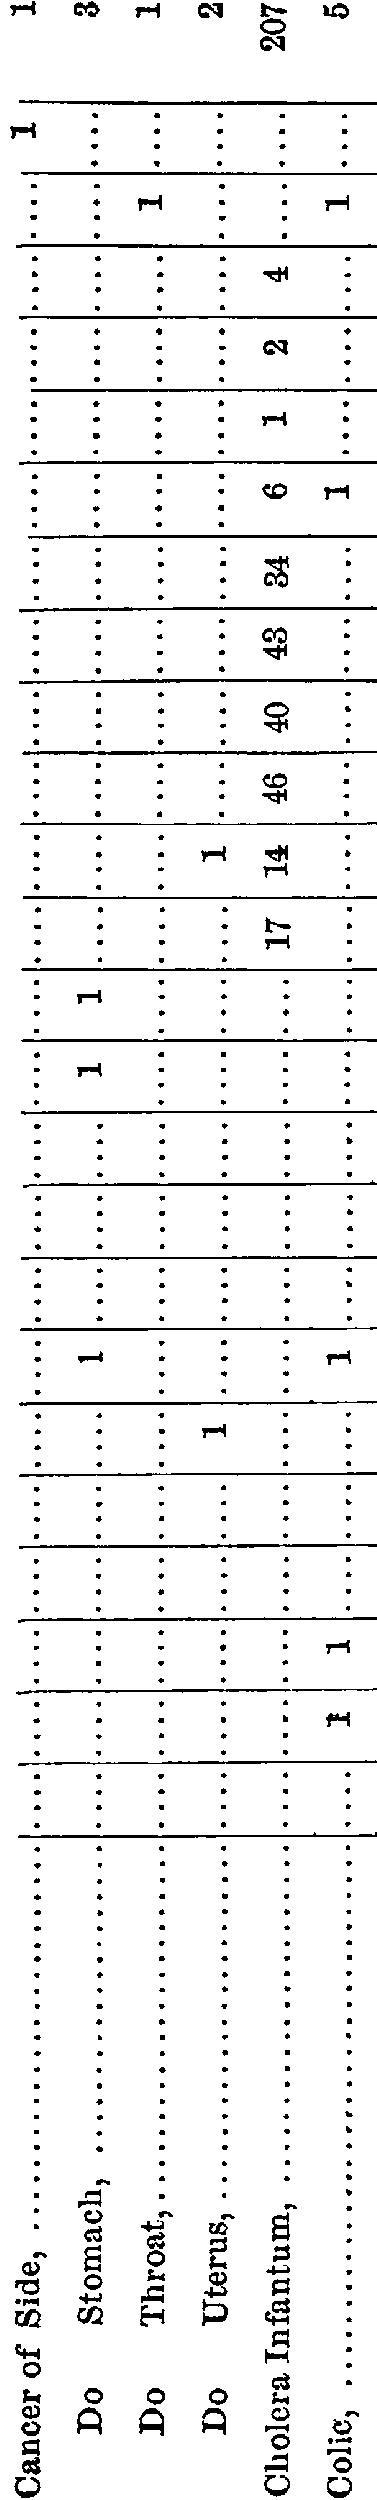 [merged small][merged small][merged small][ocr errors][ocr errors][ocr errors][merged small][merged small][ocr errors][merged small][merged small][merged small][merged small][merged small][merged small][merged small][ocr errors][merged small][merged small][merged small][merged small][merged small][ocr errors][merged small][merged small][merged small][merged small][merged small][merged small][merged small][merged small][merged small][merged small][merged small][merged small][merged small][ocr errors][merged small][merged small][merged small][merged small][merged small]